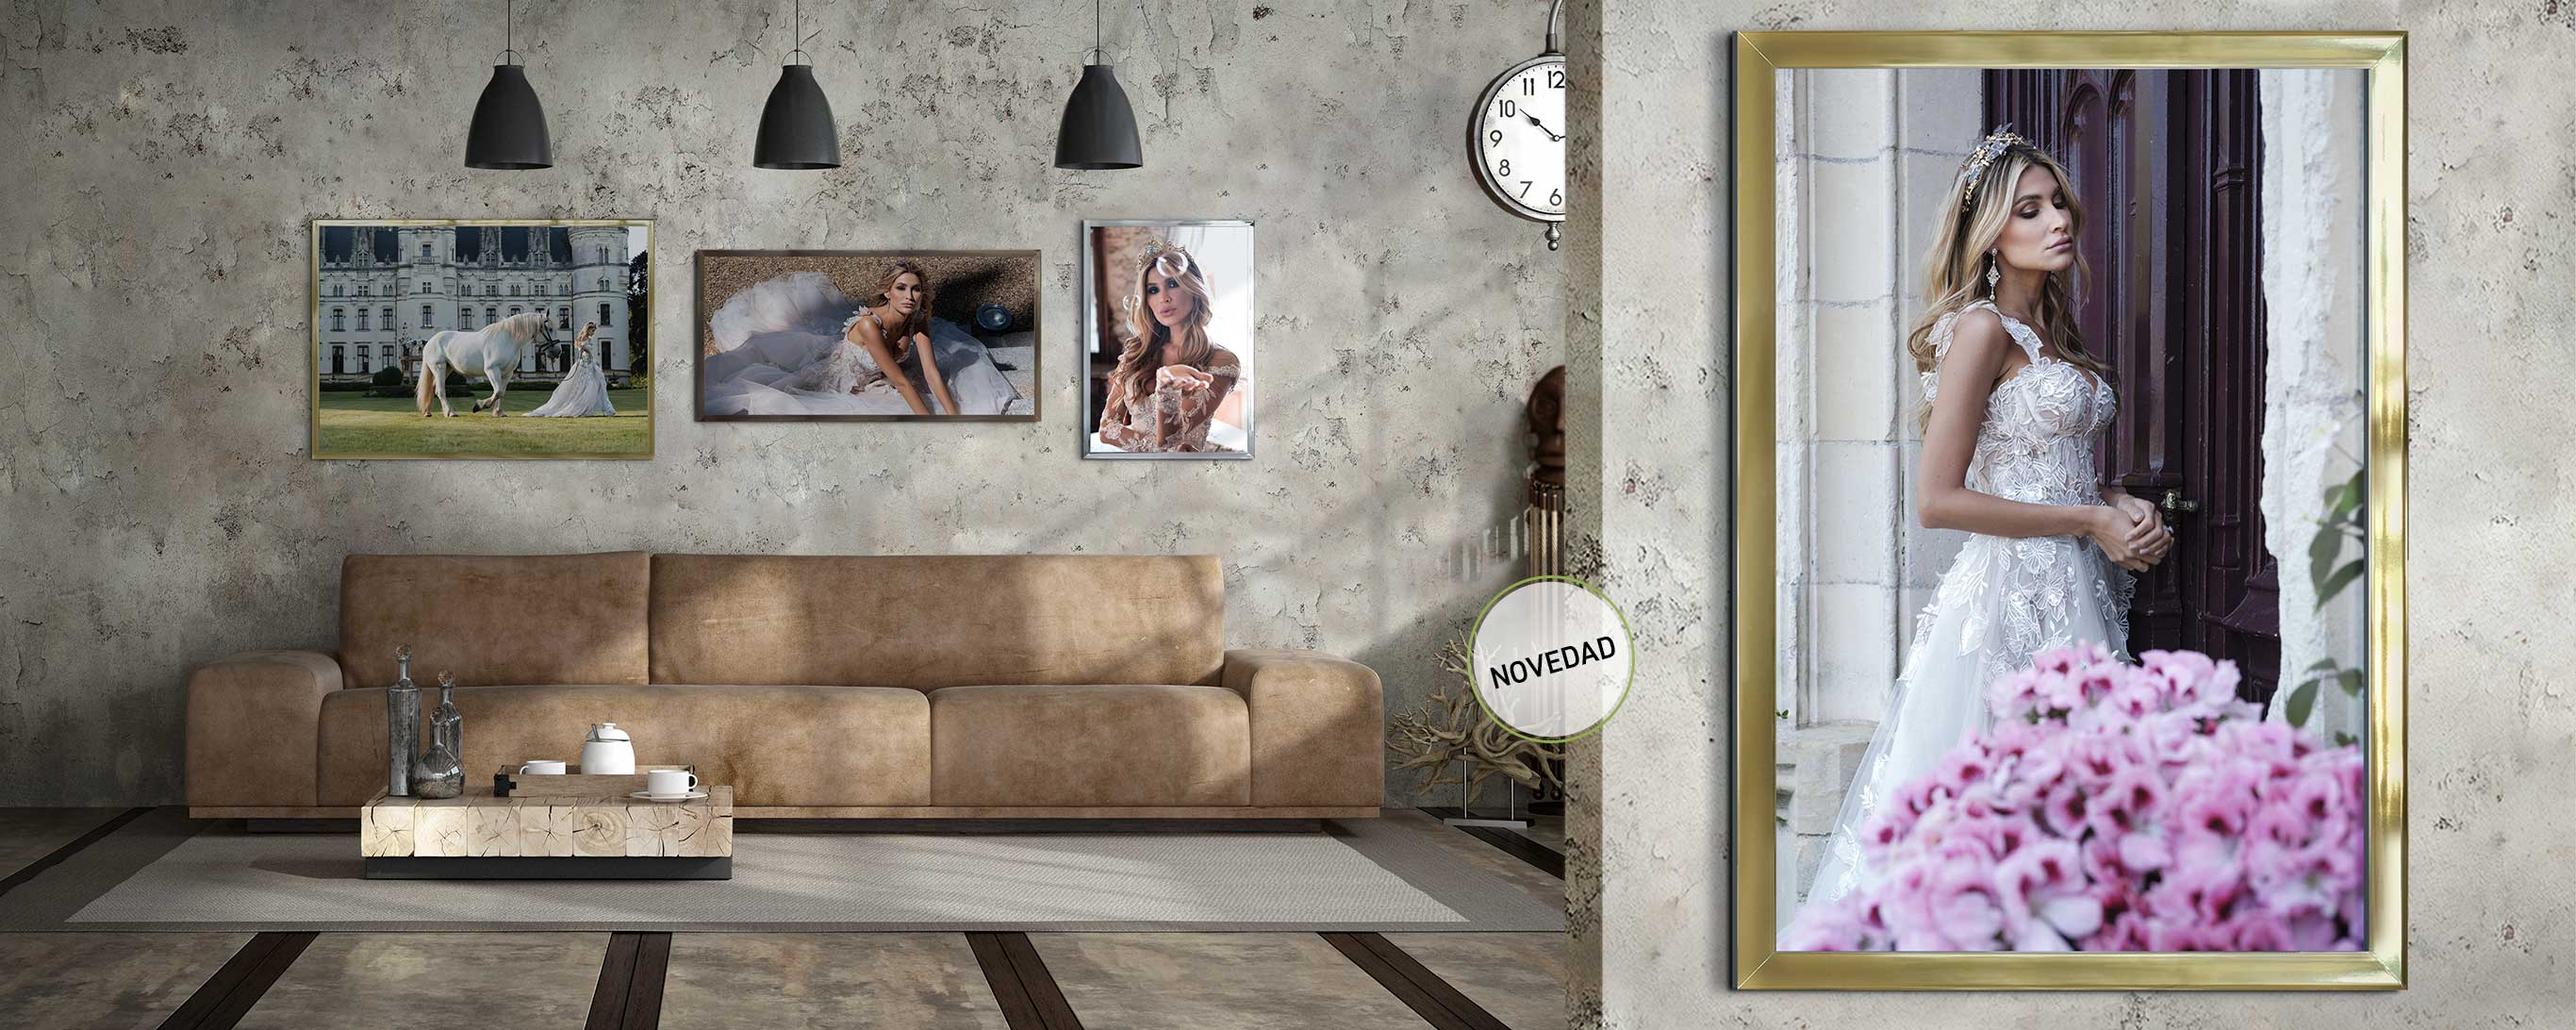 BN_Cornici_06_ESP_B